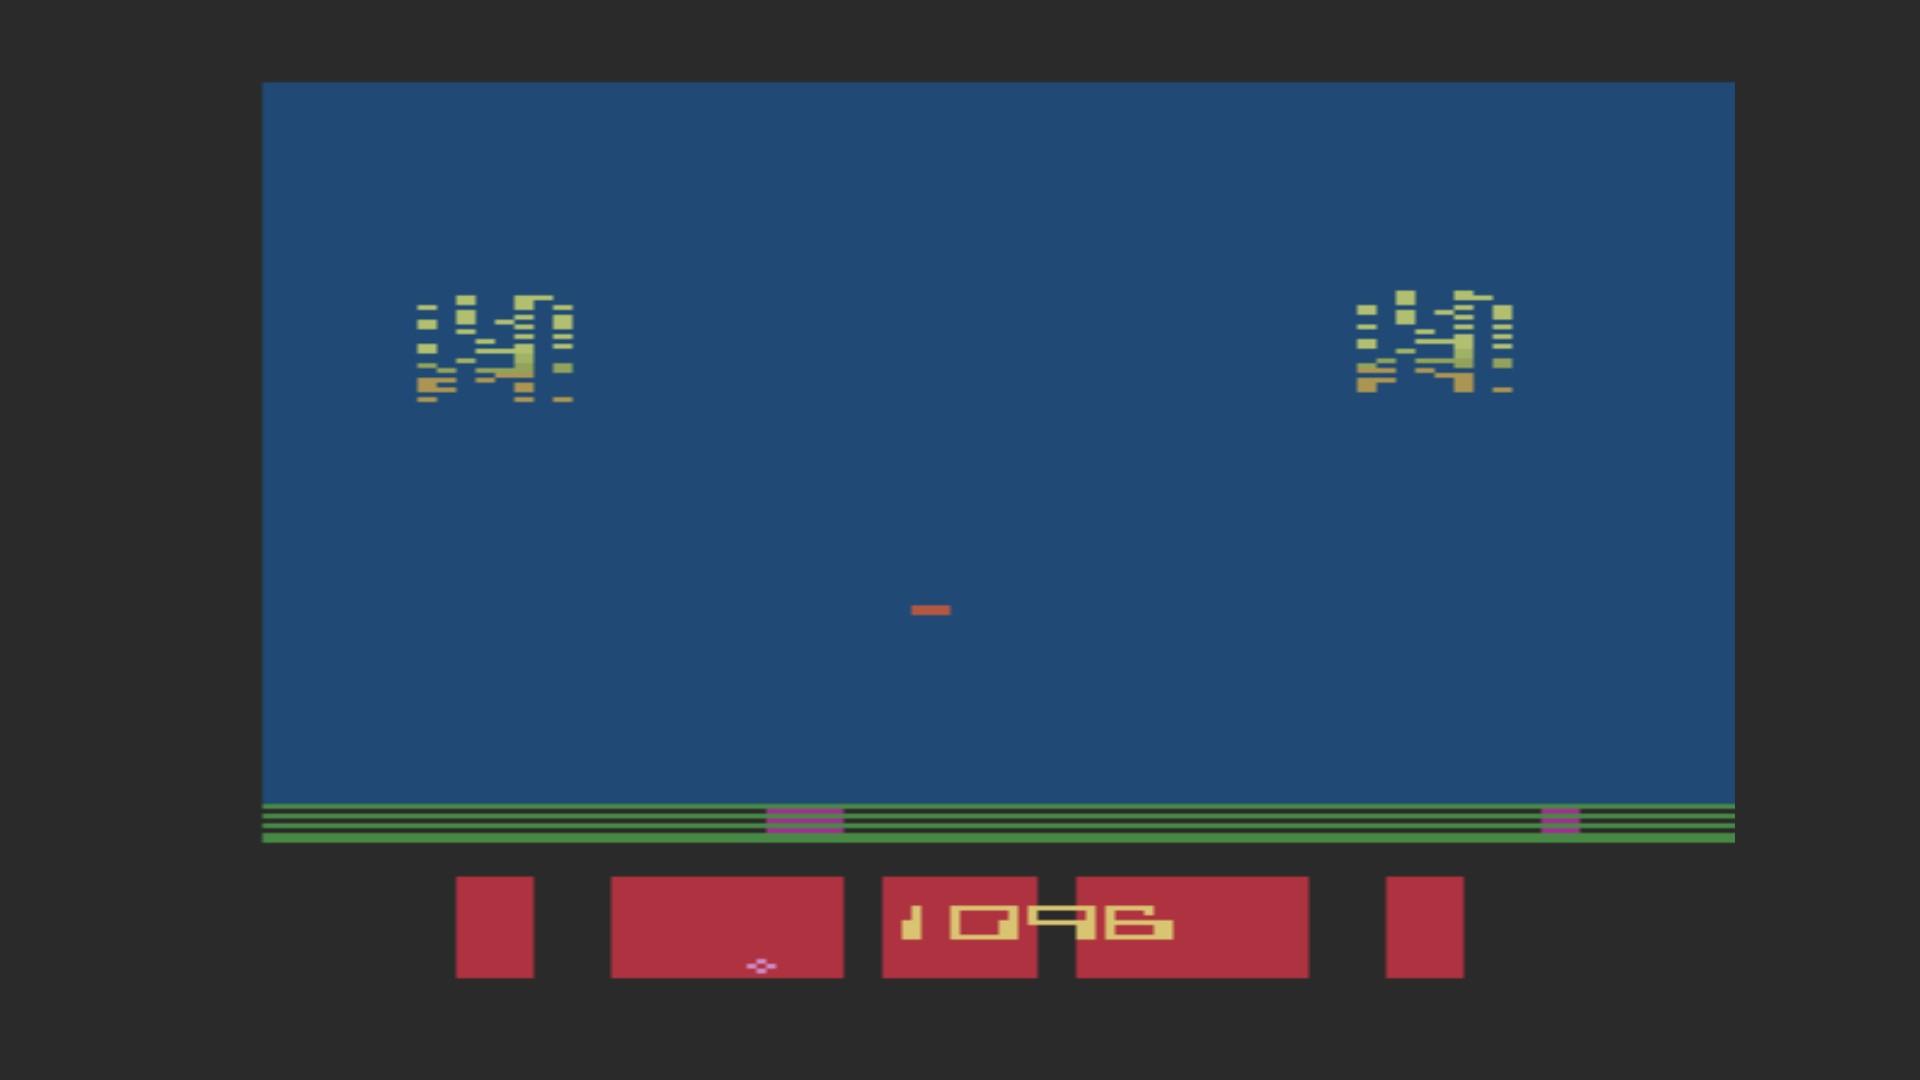 AkinNahtanoj: Saboteur (Atari 2600 Emulated Novice/B Mode) 1,096 points on 2020-10-28 05:26:18